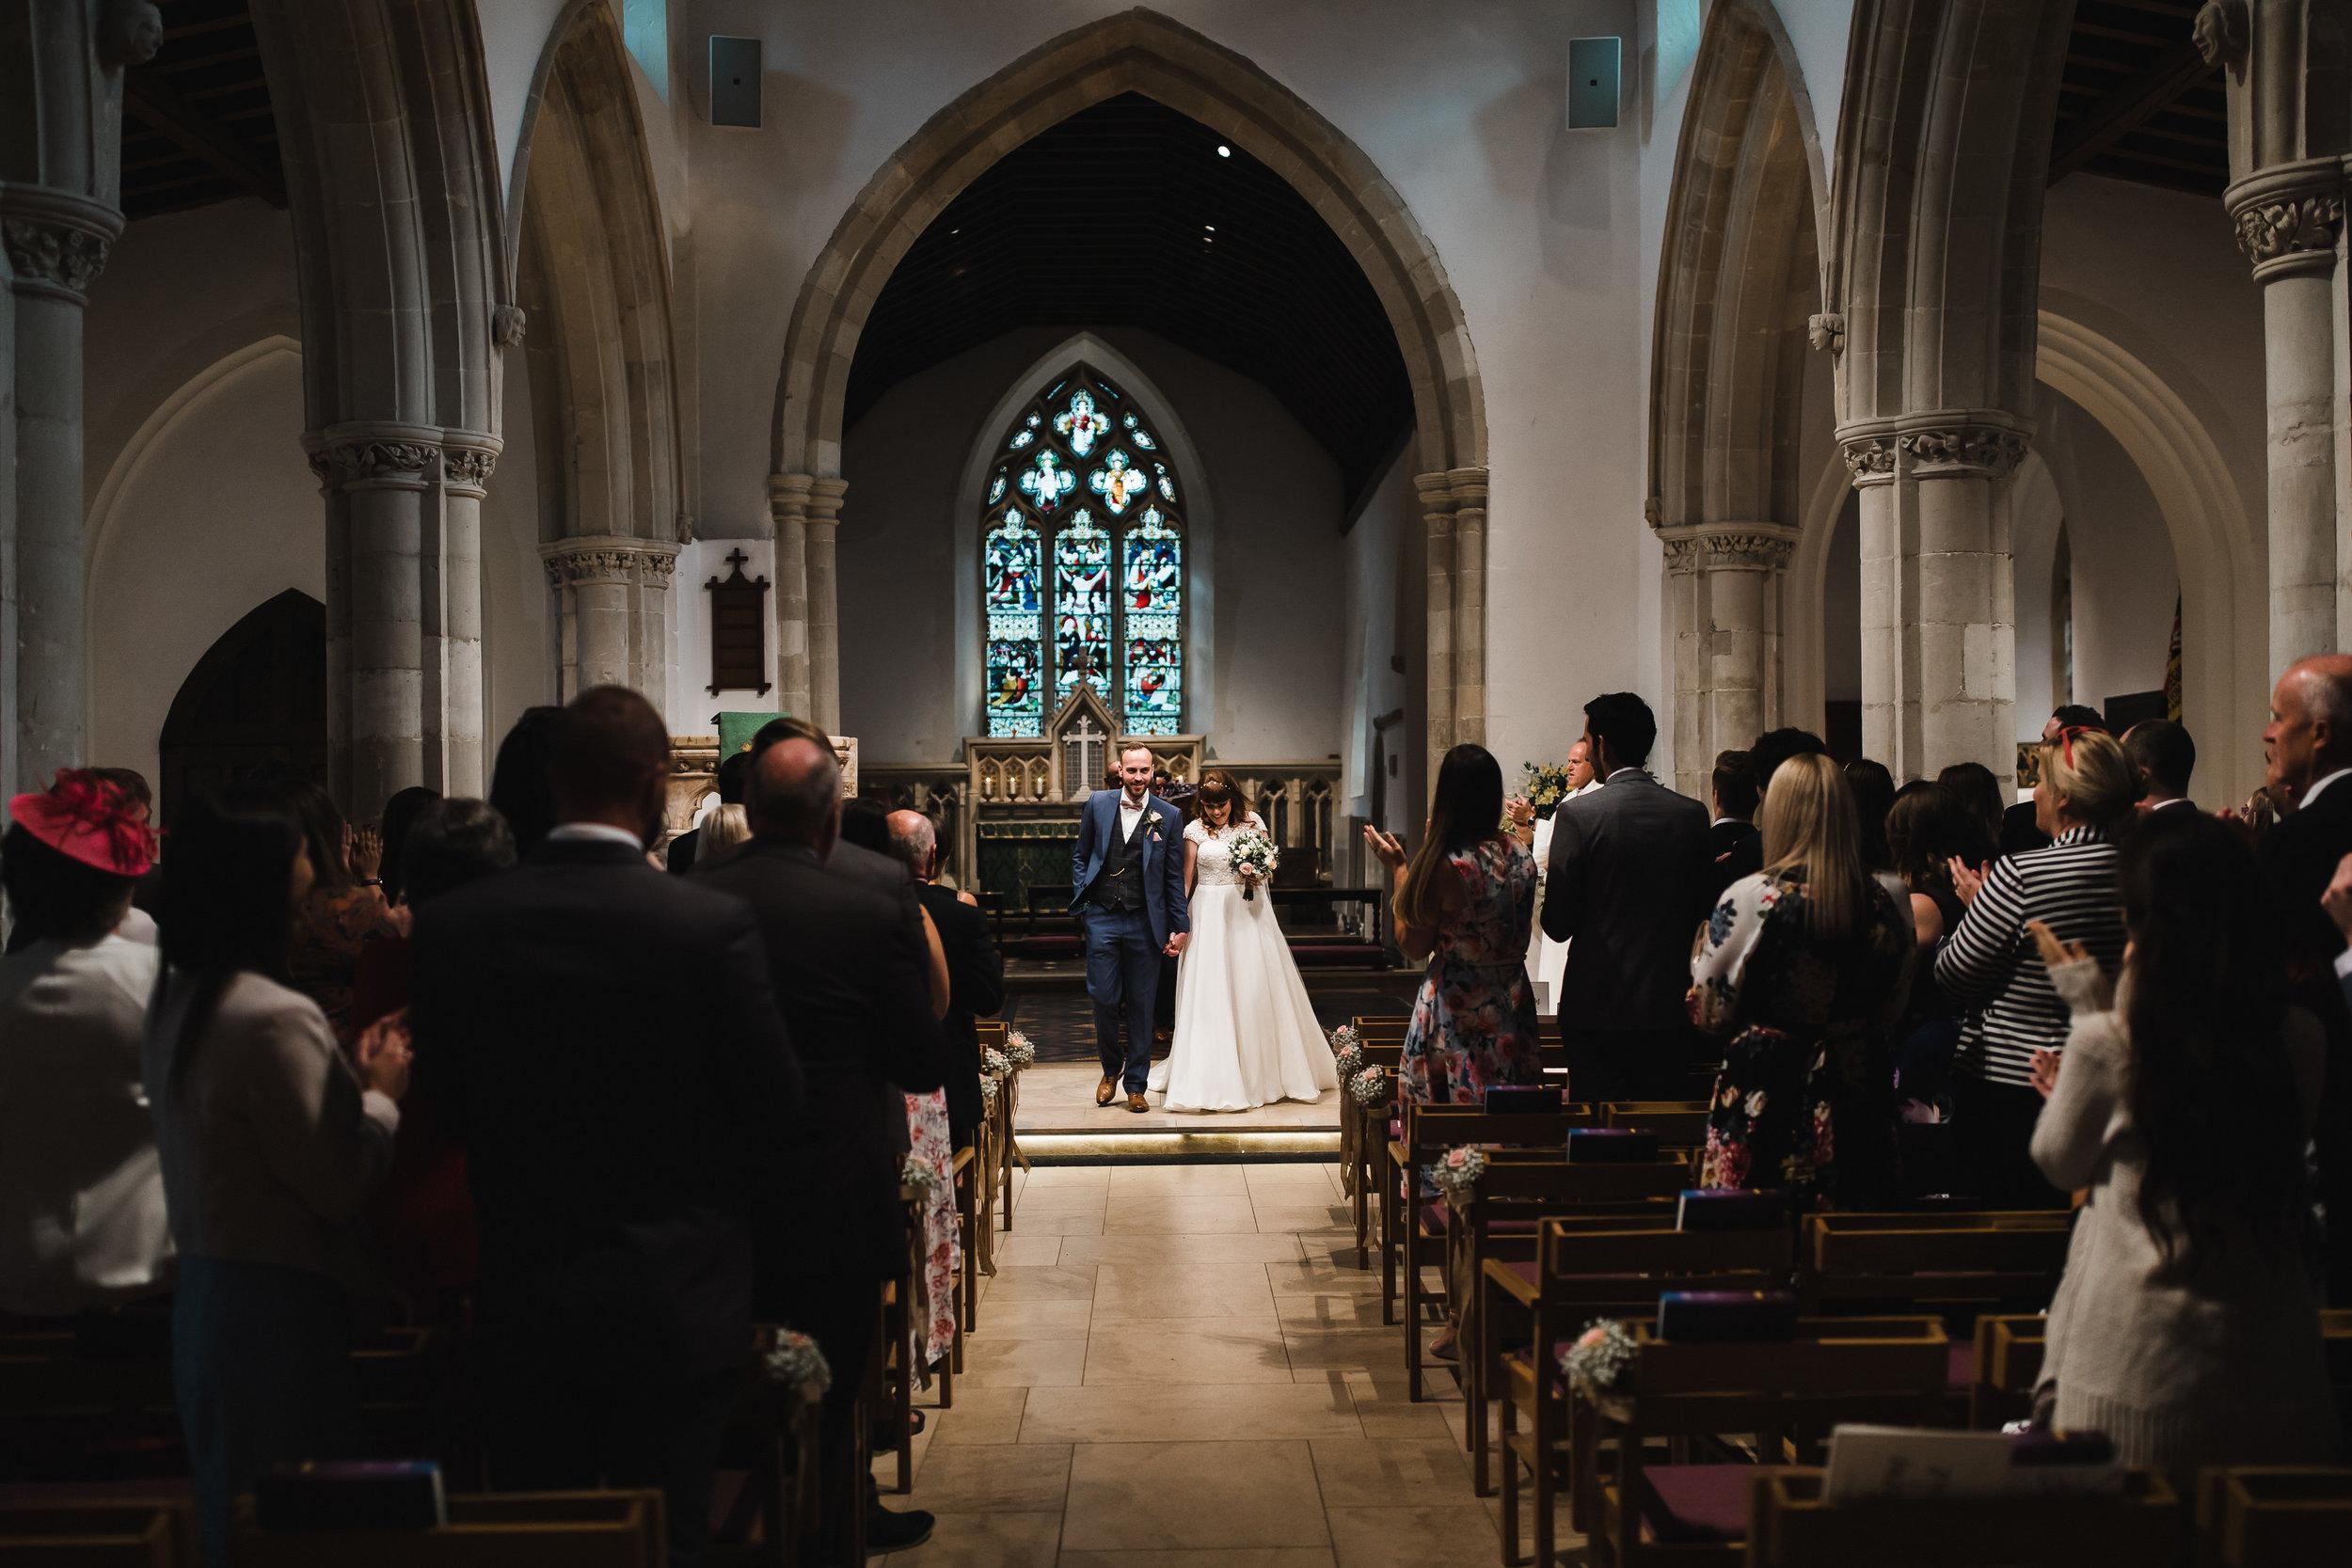 Nether_Wichendon_House_Wedding_026.jpg